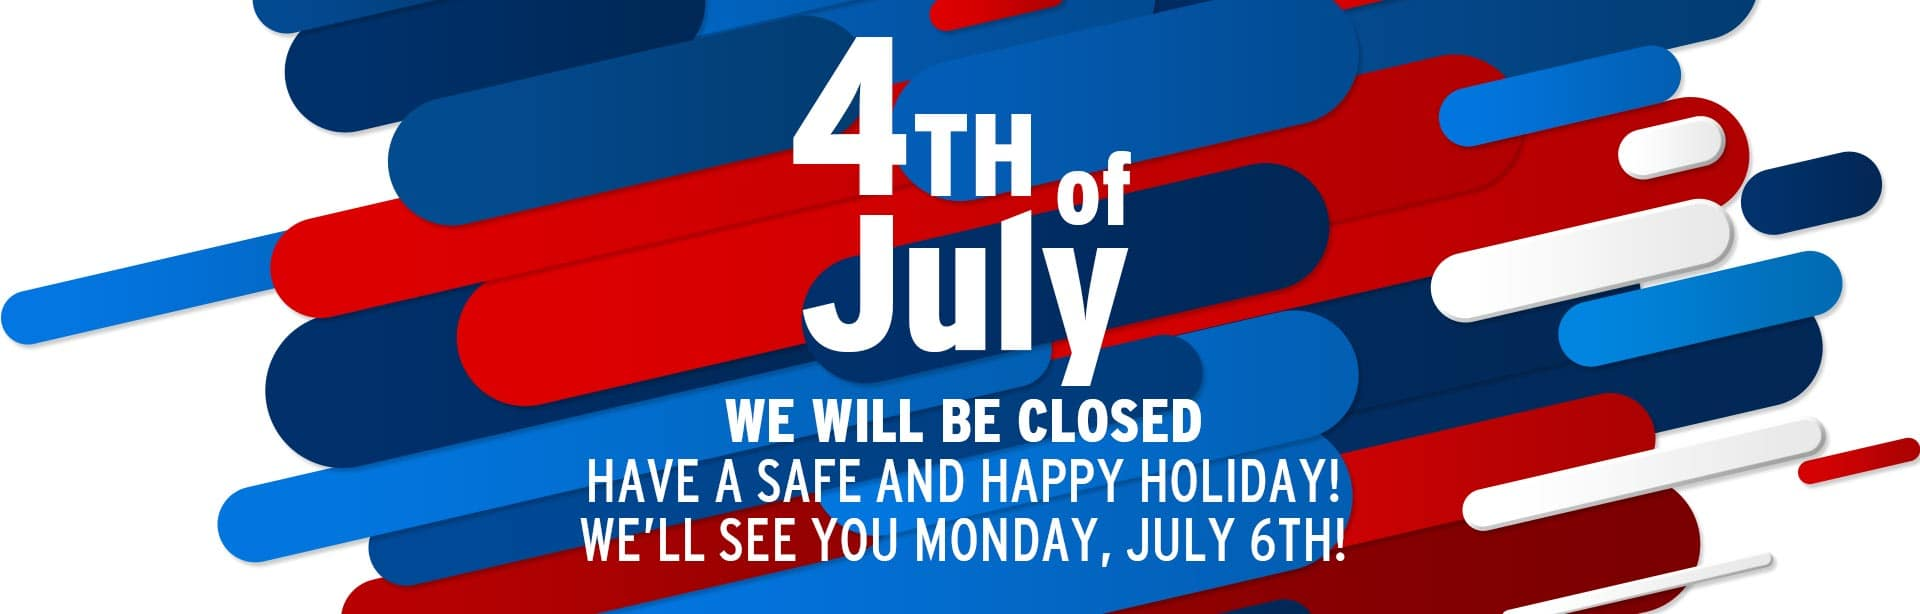 York CDJR-BZ will be closed July 4th